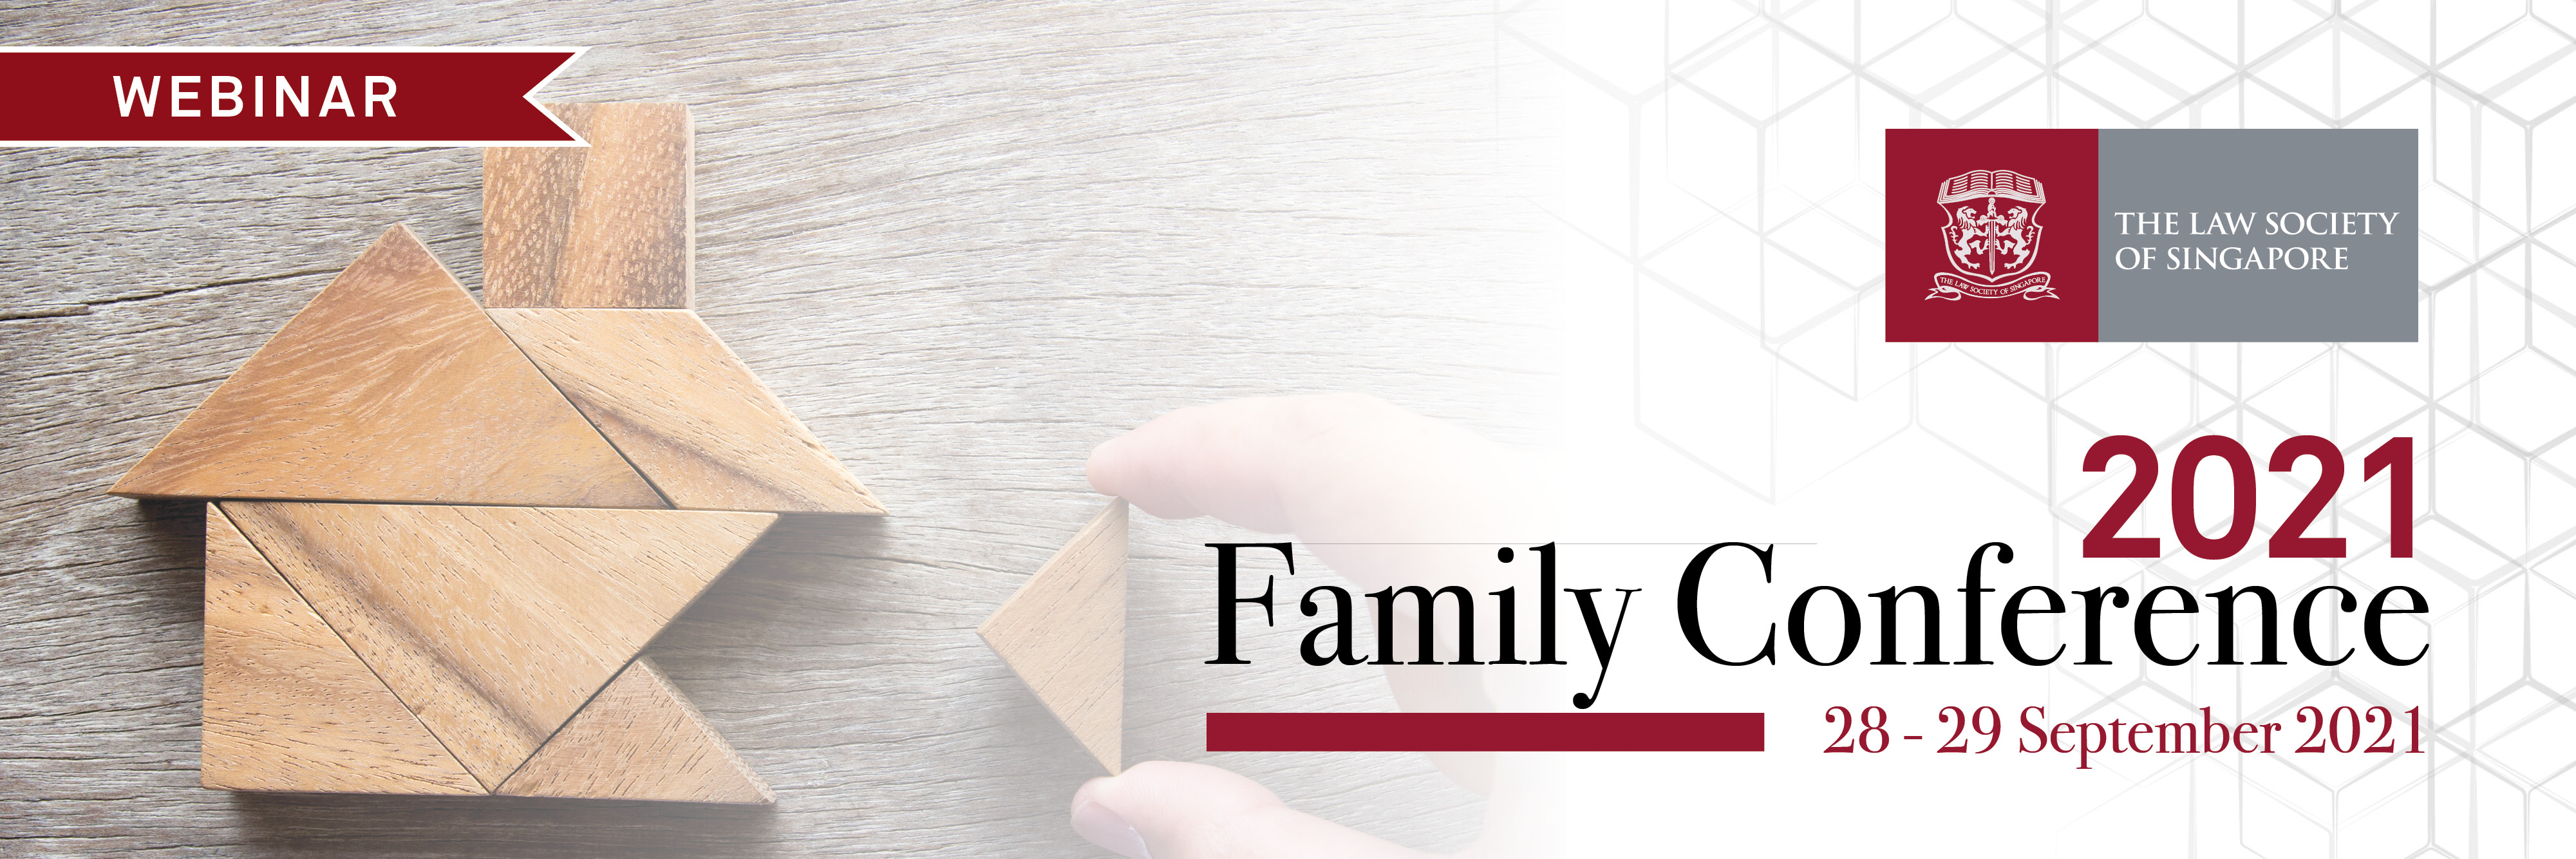 [Webinar] Family Conference 2021 Banner Image